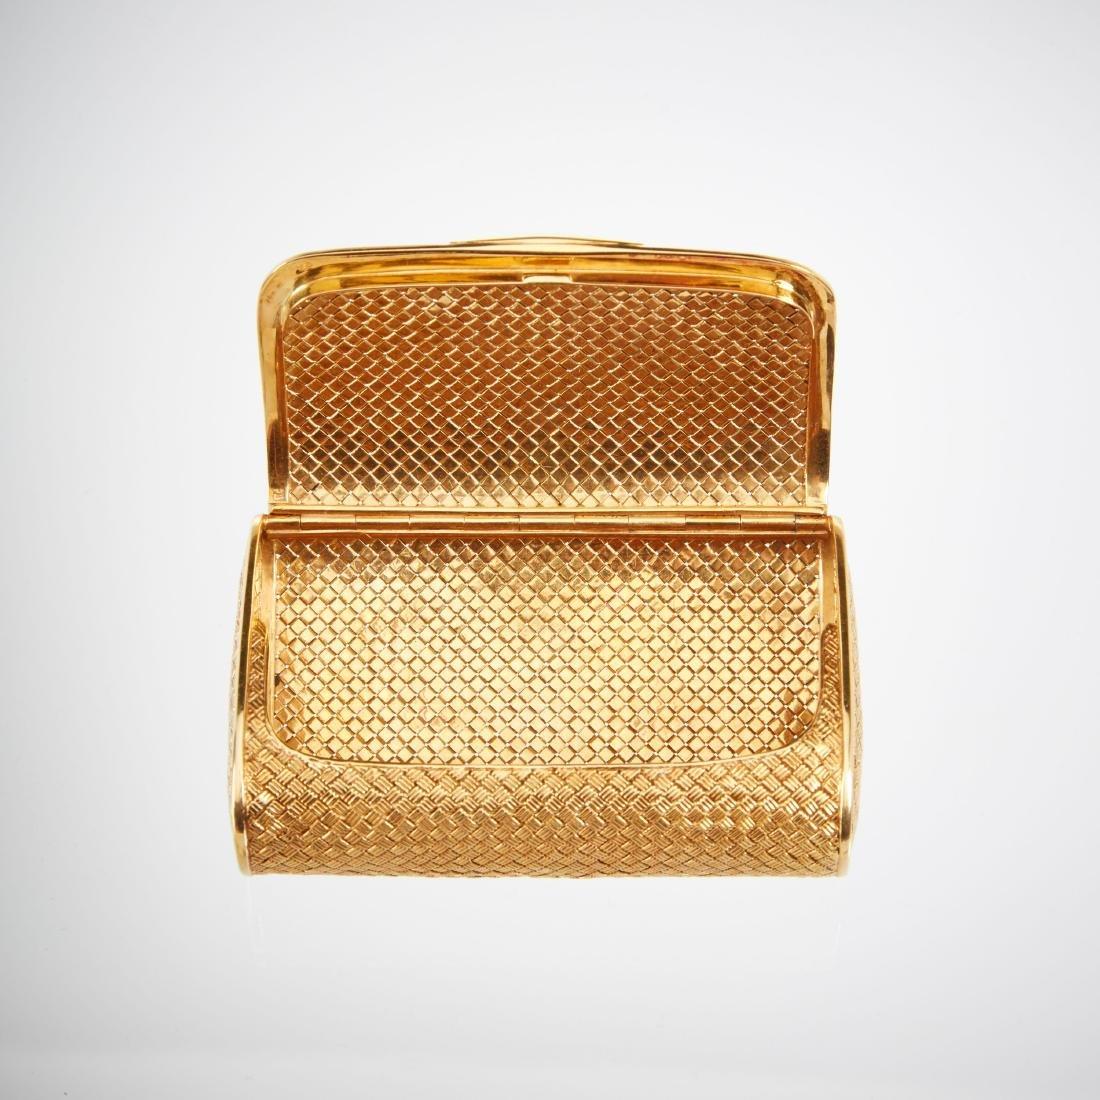 An Italian 18K Gold & Diamond Clutch - 3